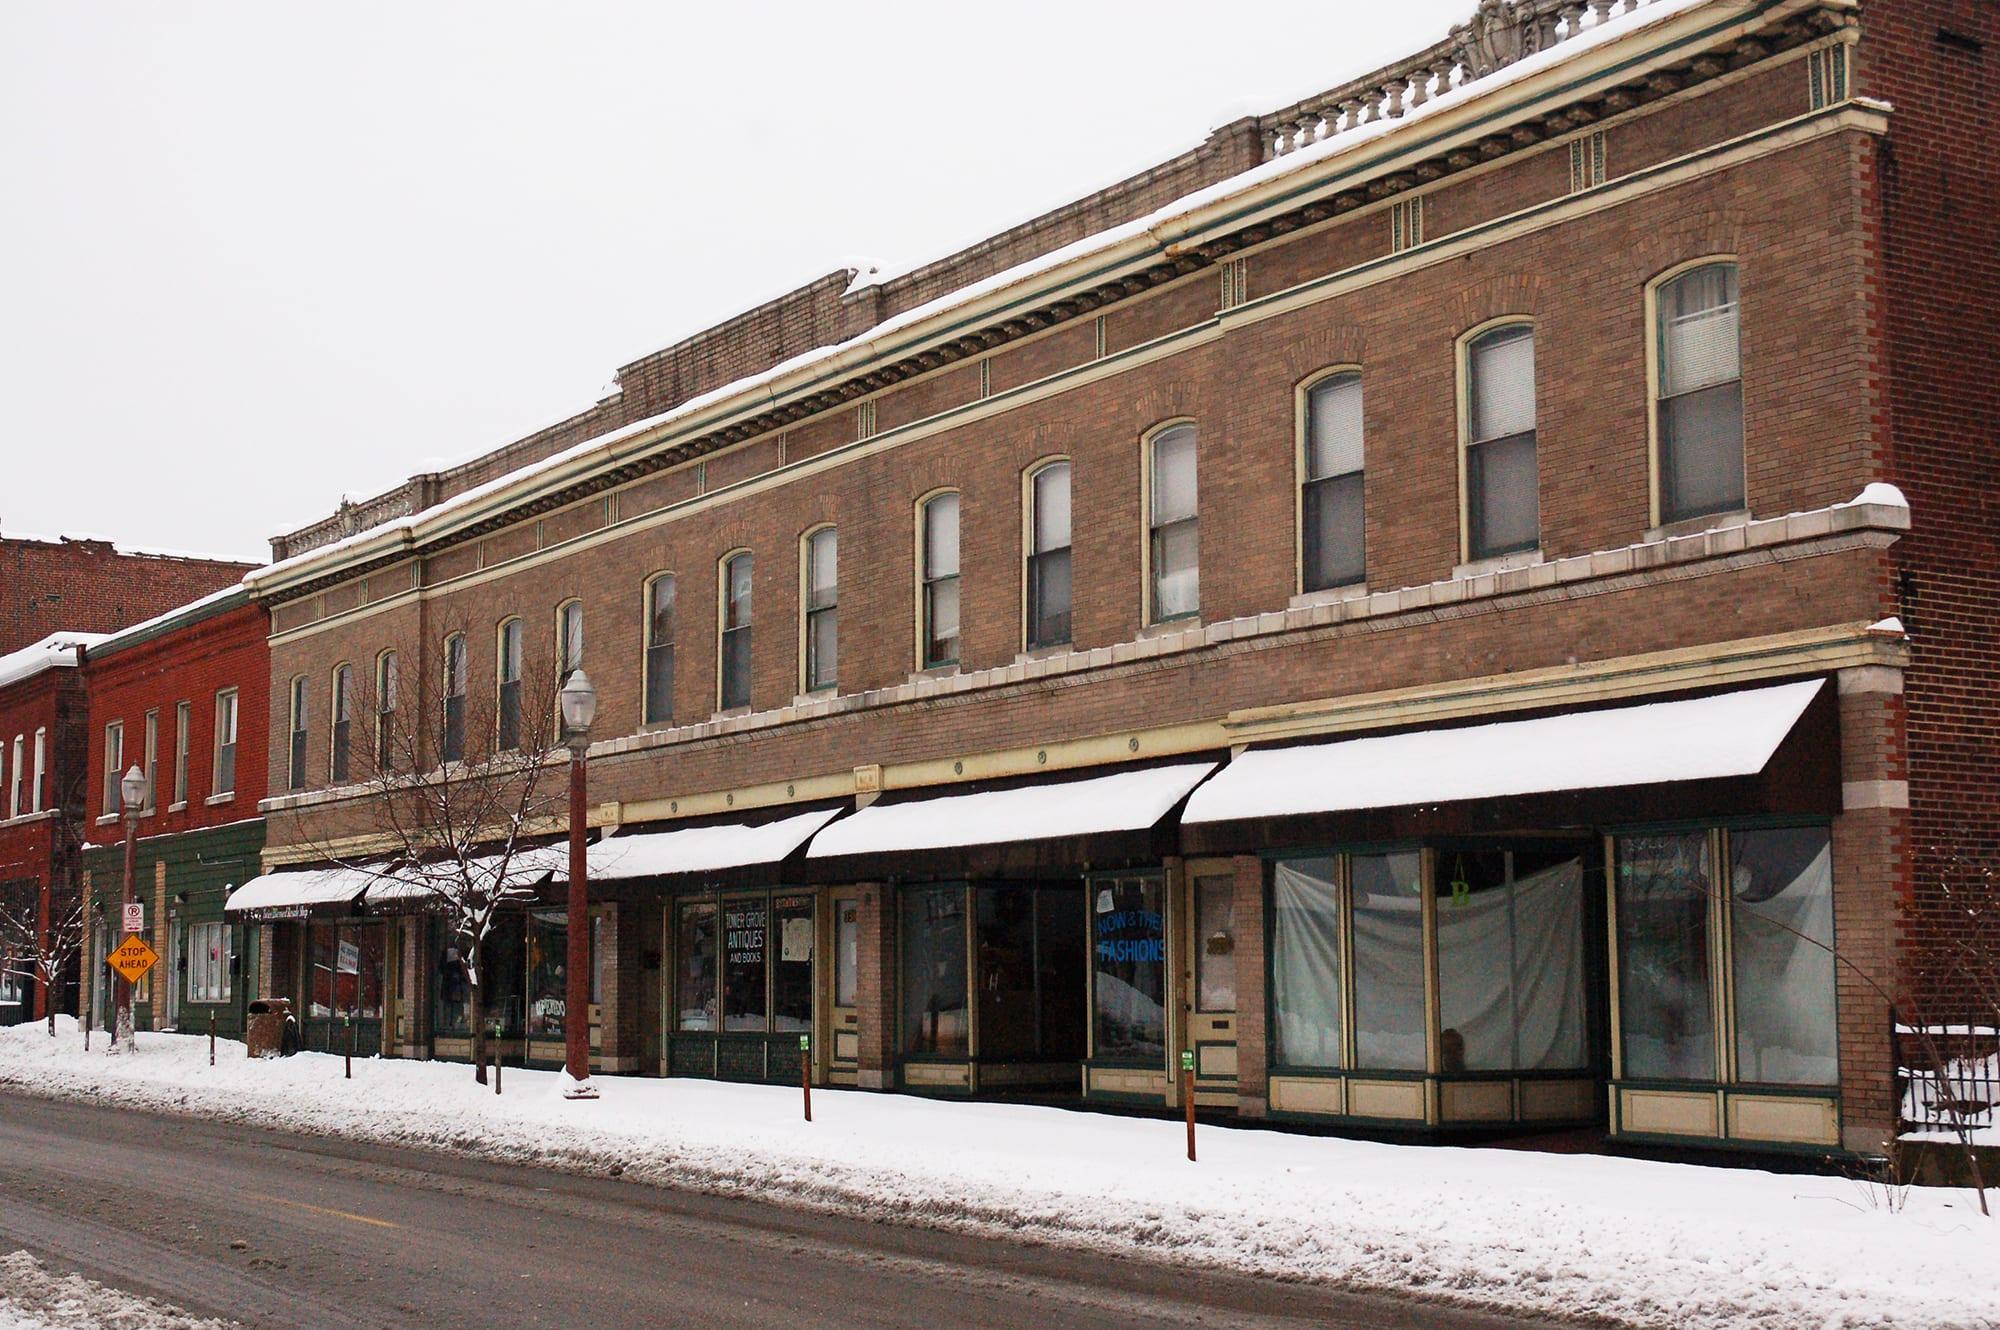 Shops on Meramec in the snow.